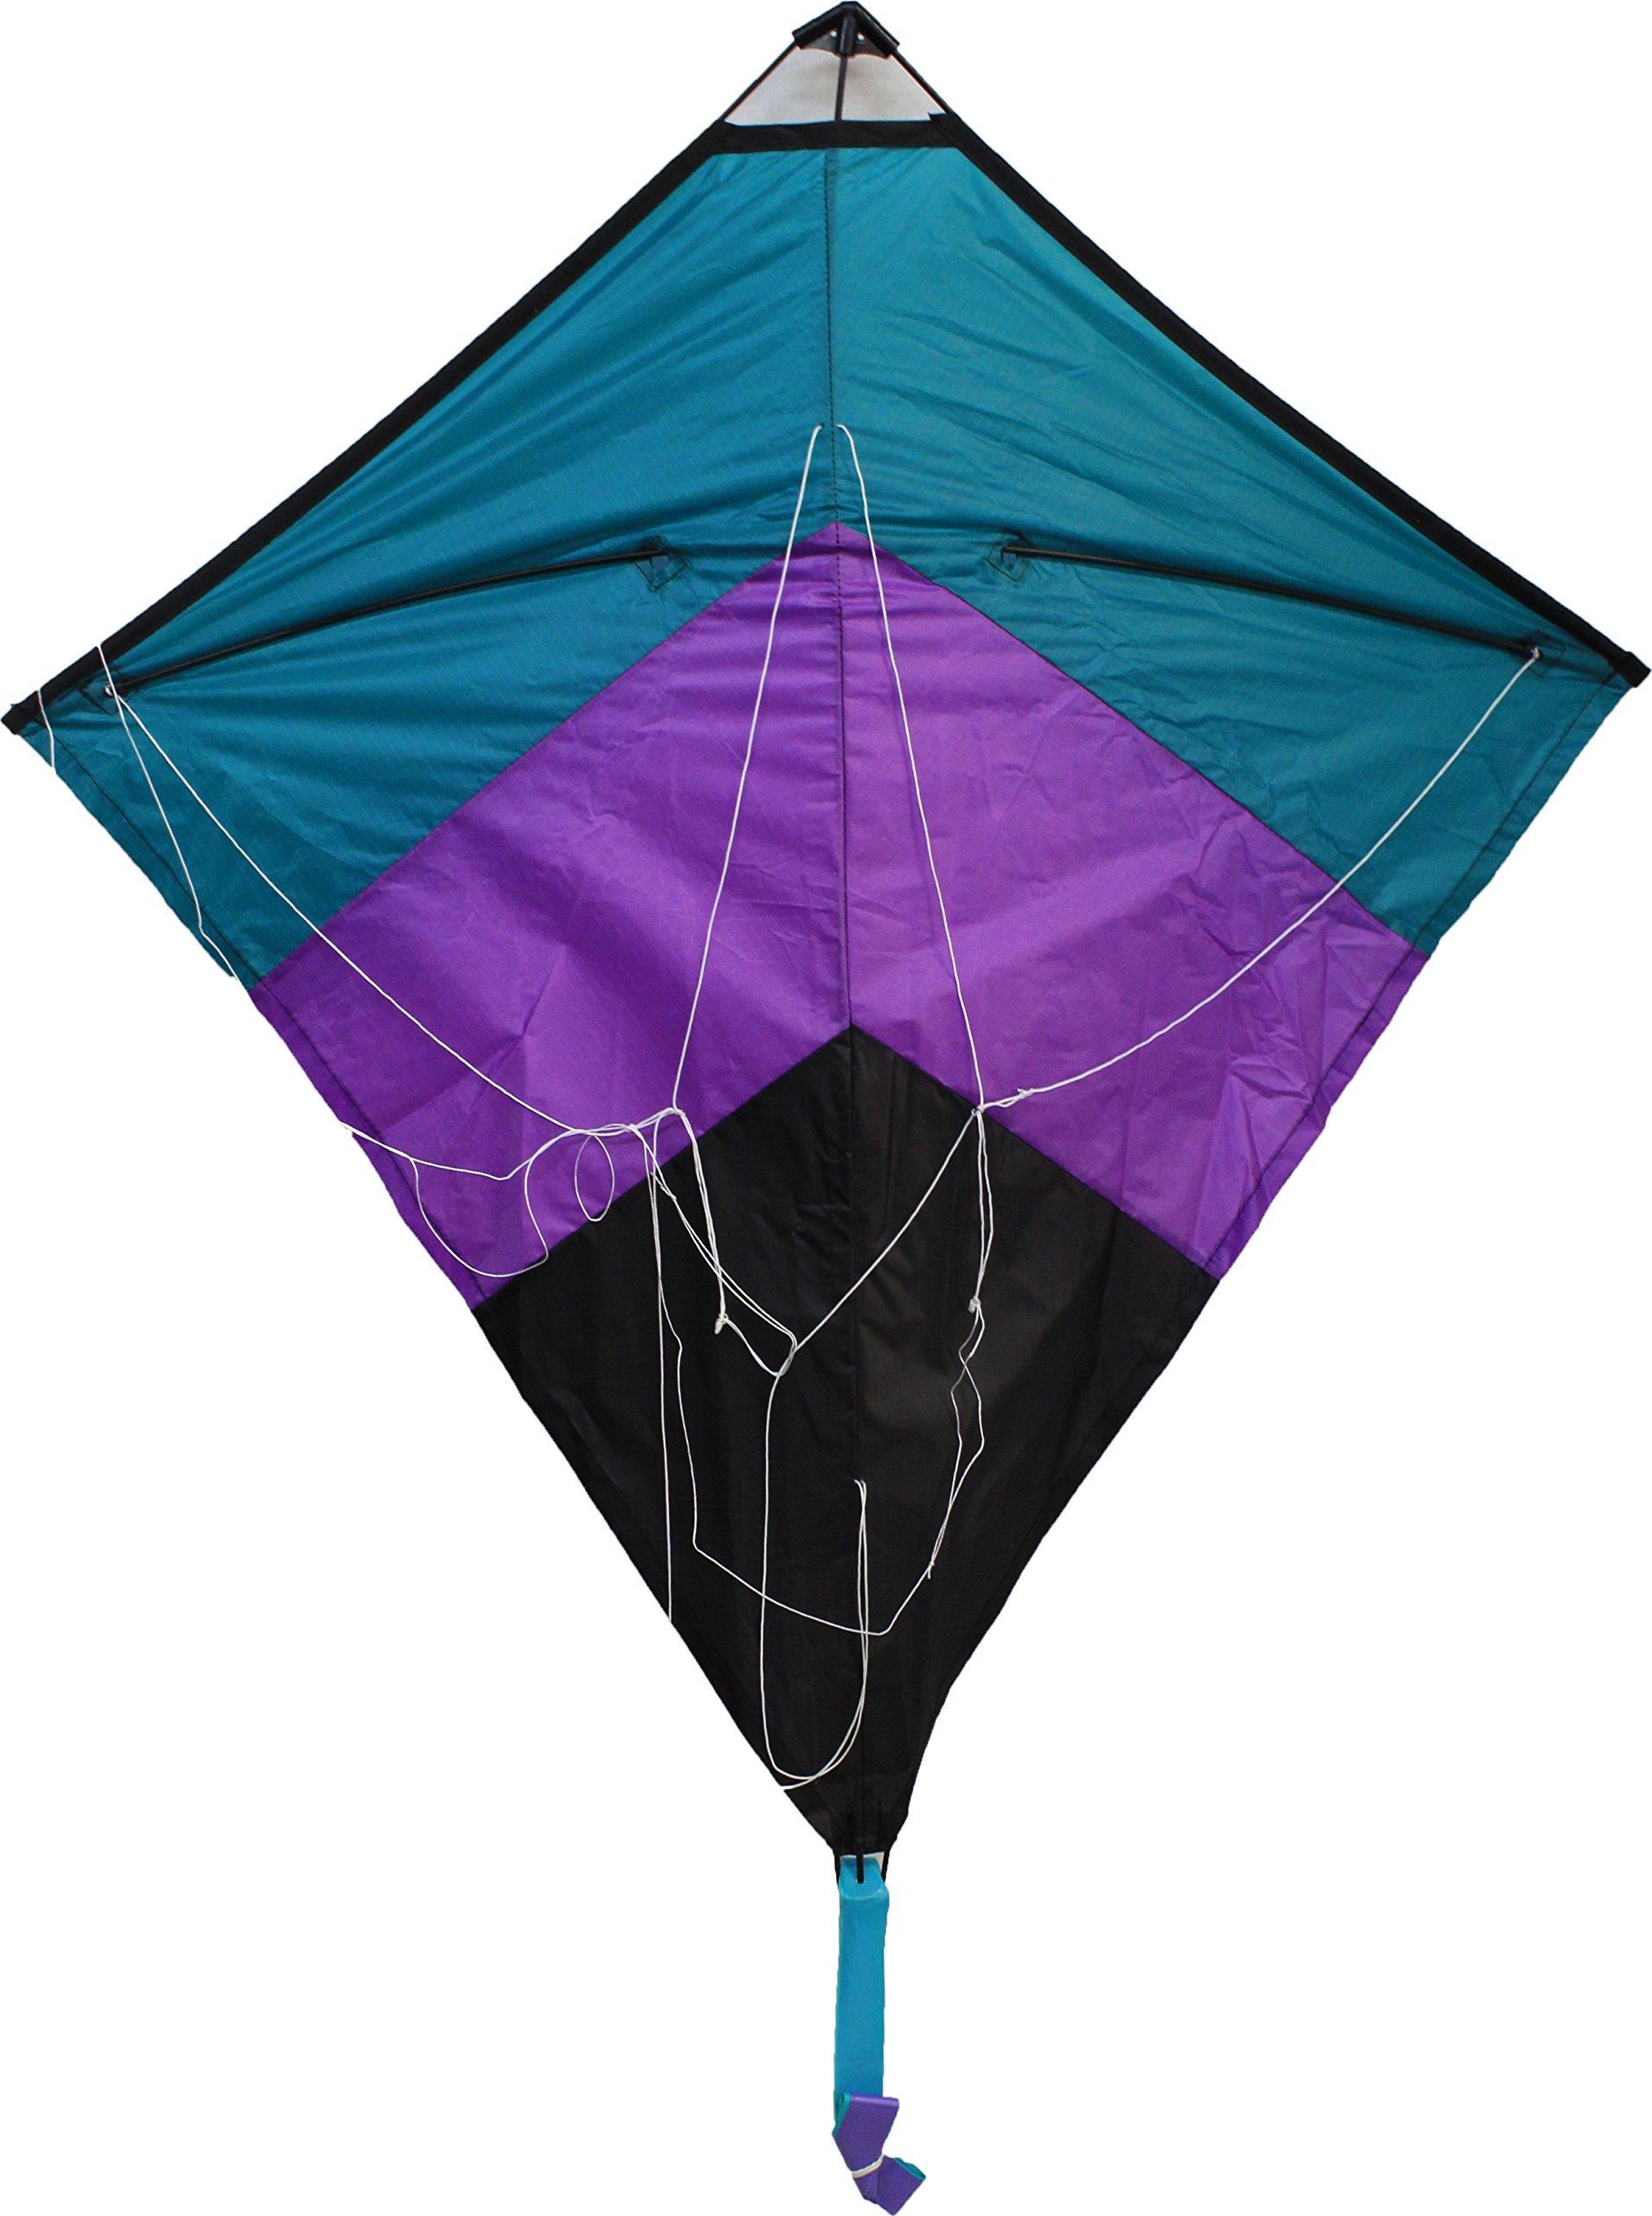 WindNSun Dual Control Chevron Diamond Stunt Kite, 36'' Tall